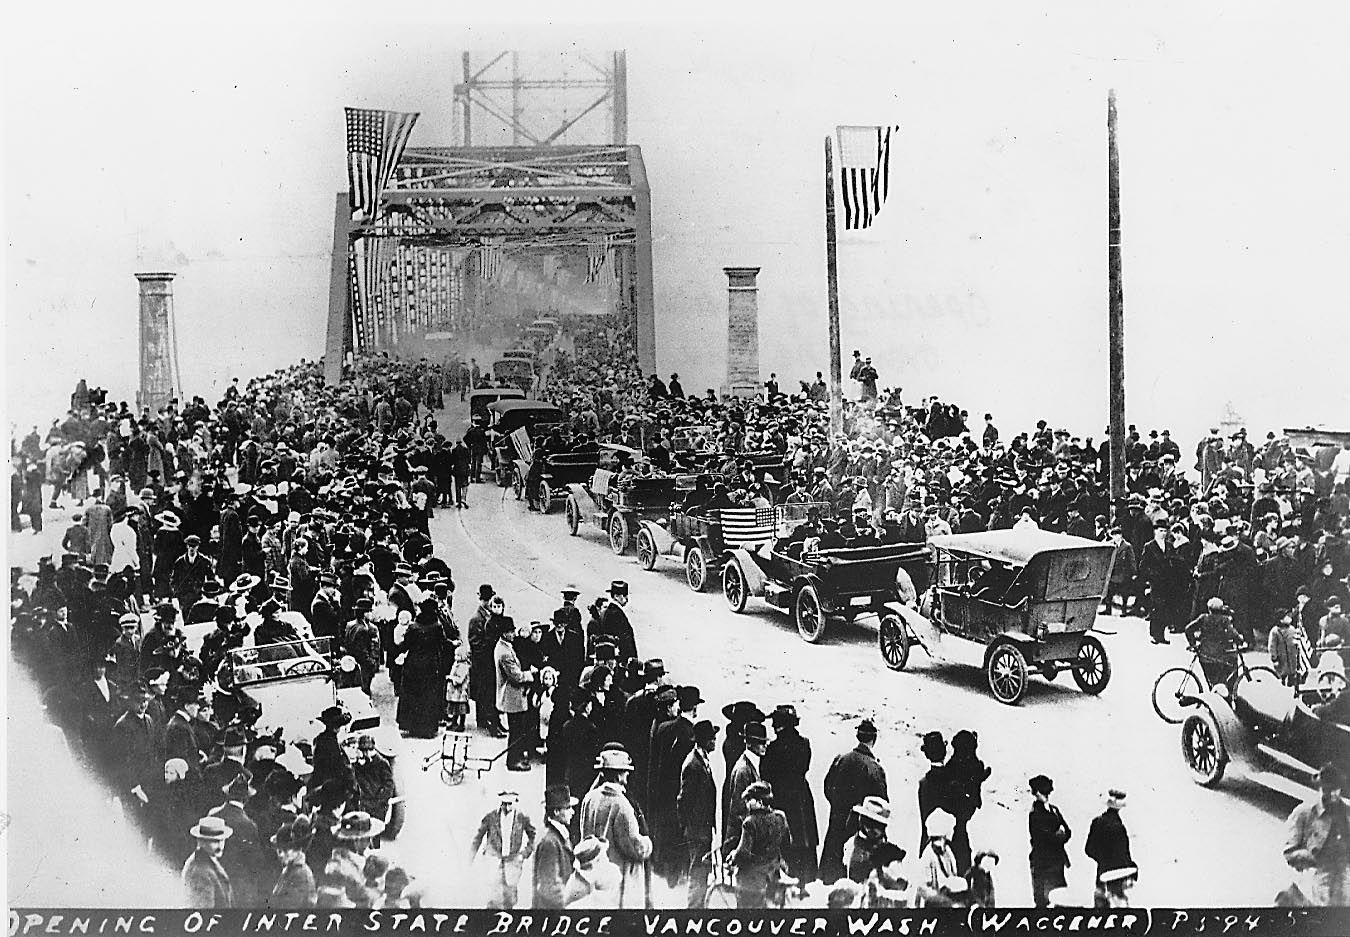 I5 bridge opening clark county history pinterest